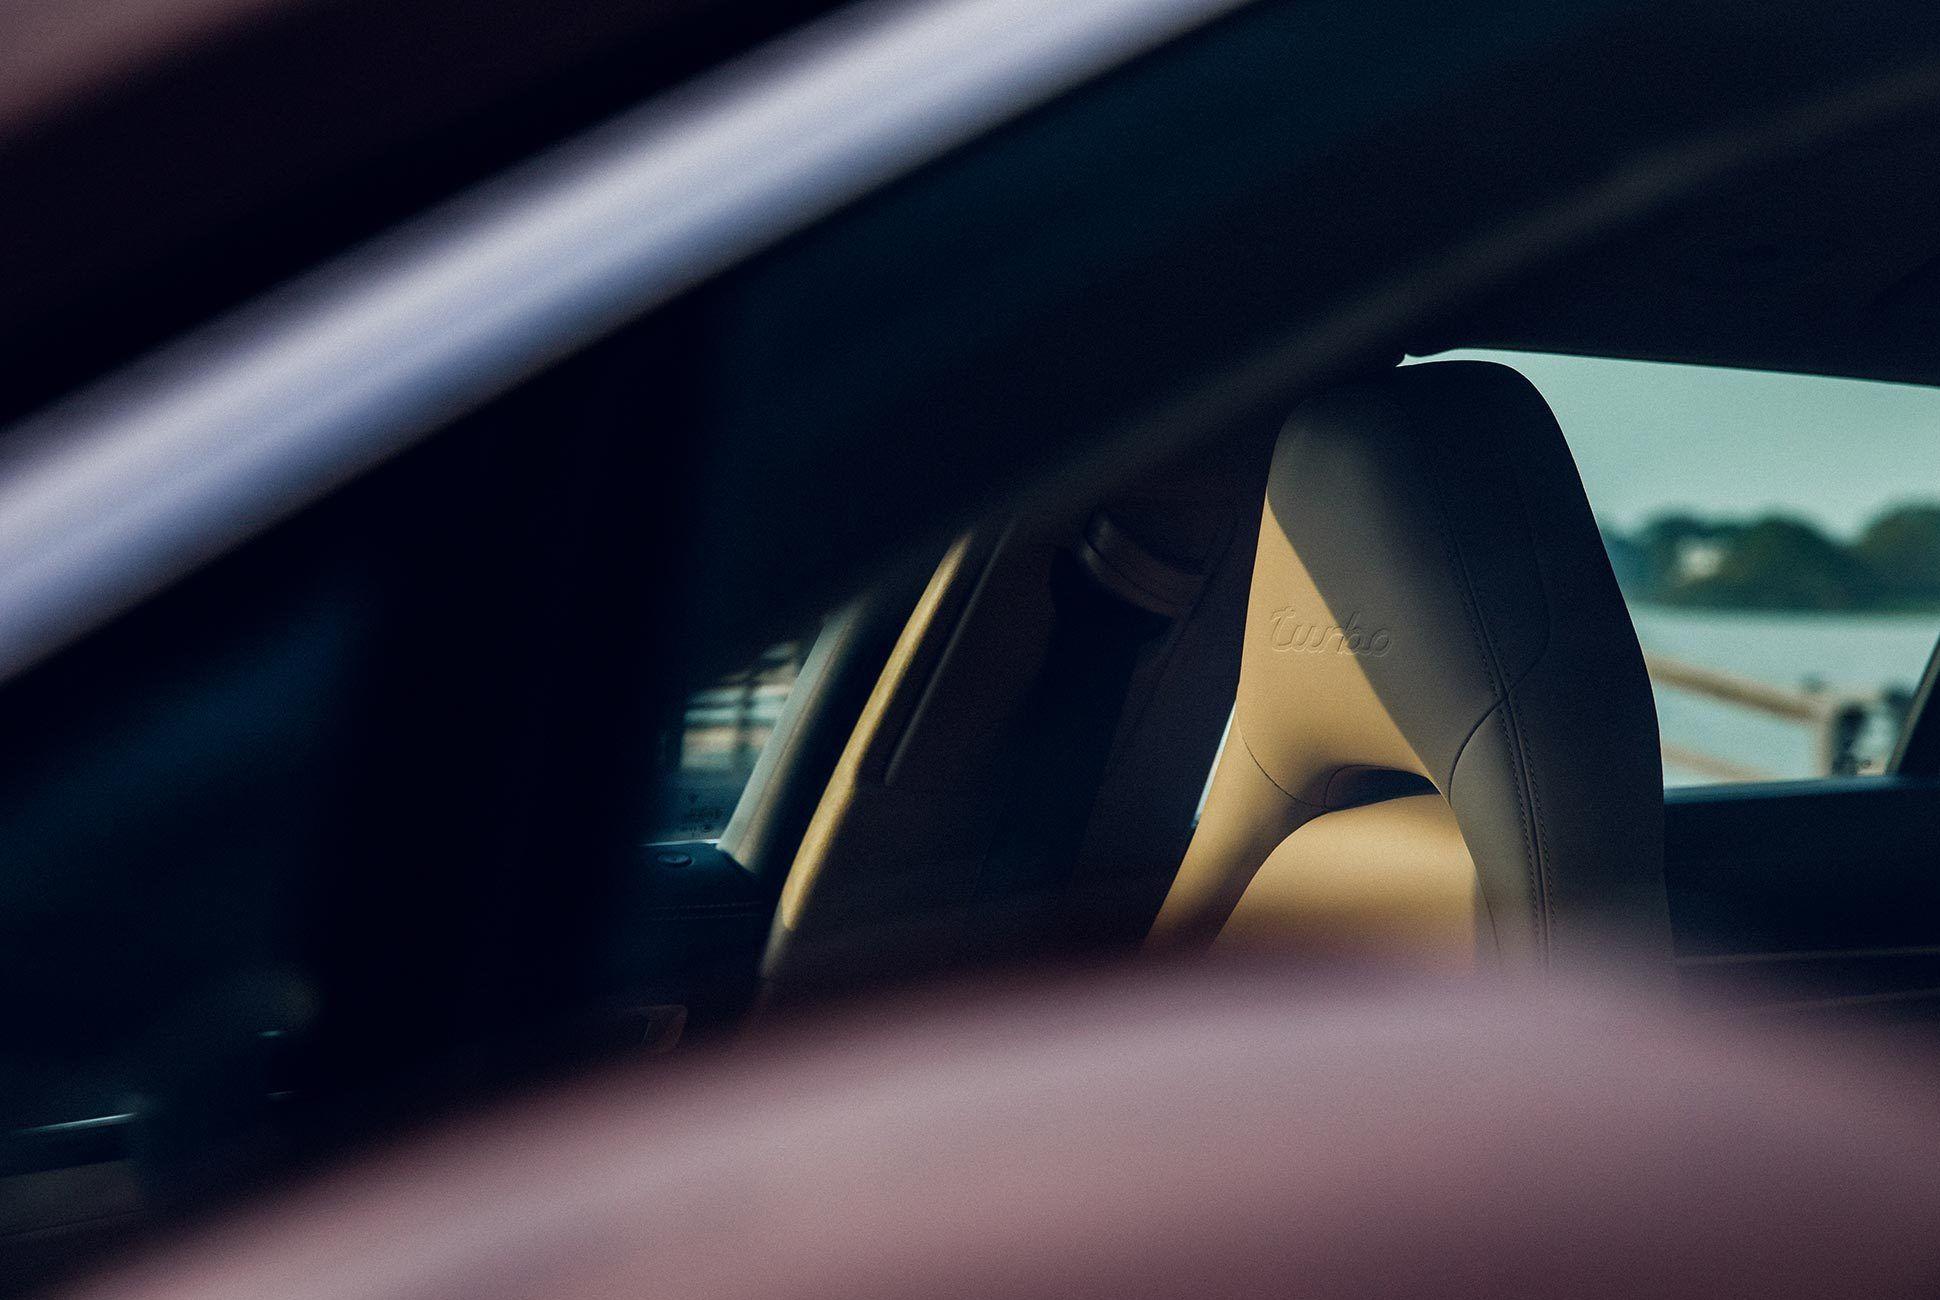 Porsche-Panamera-Turbo-Sport-Turismo-Review-gear-patrol-slide-5